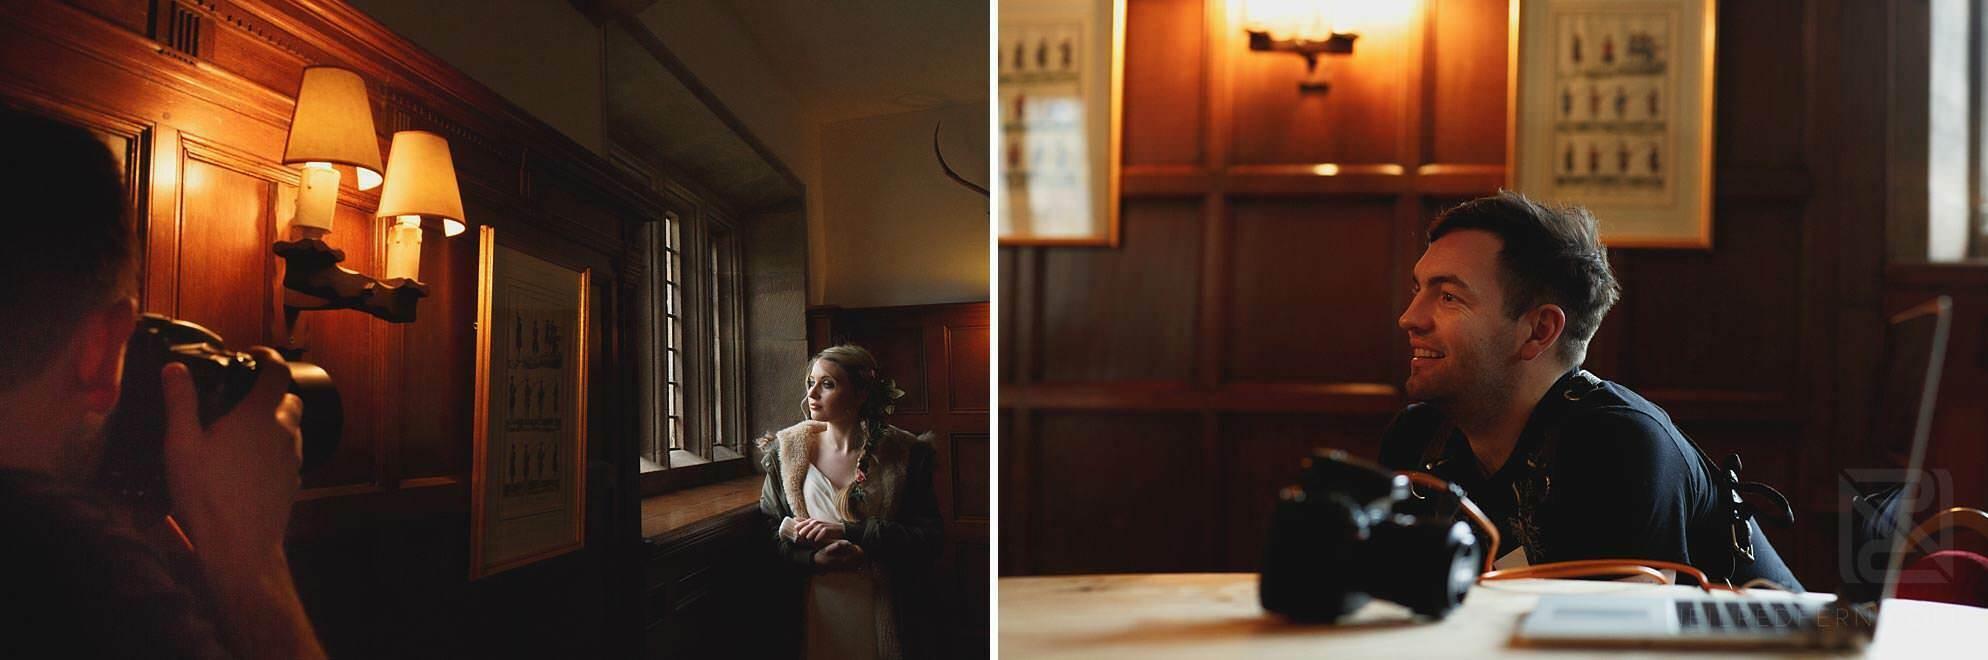 behind-the-scene-photograph-Neil-Redfern-workshop-14